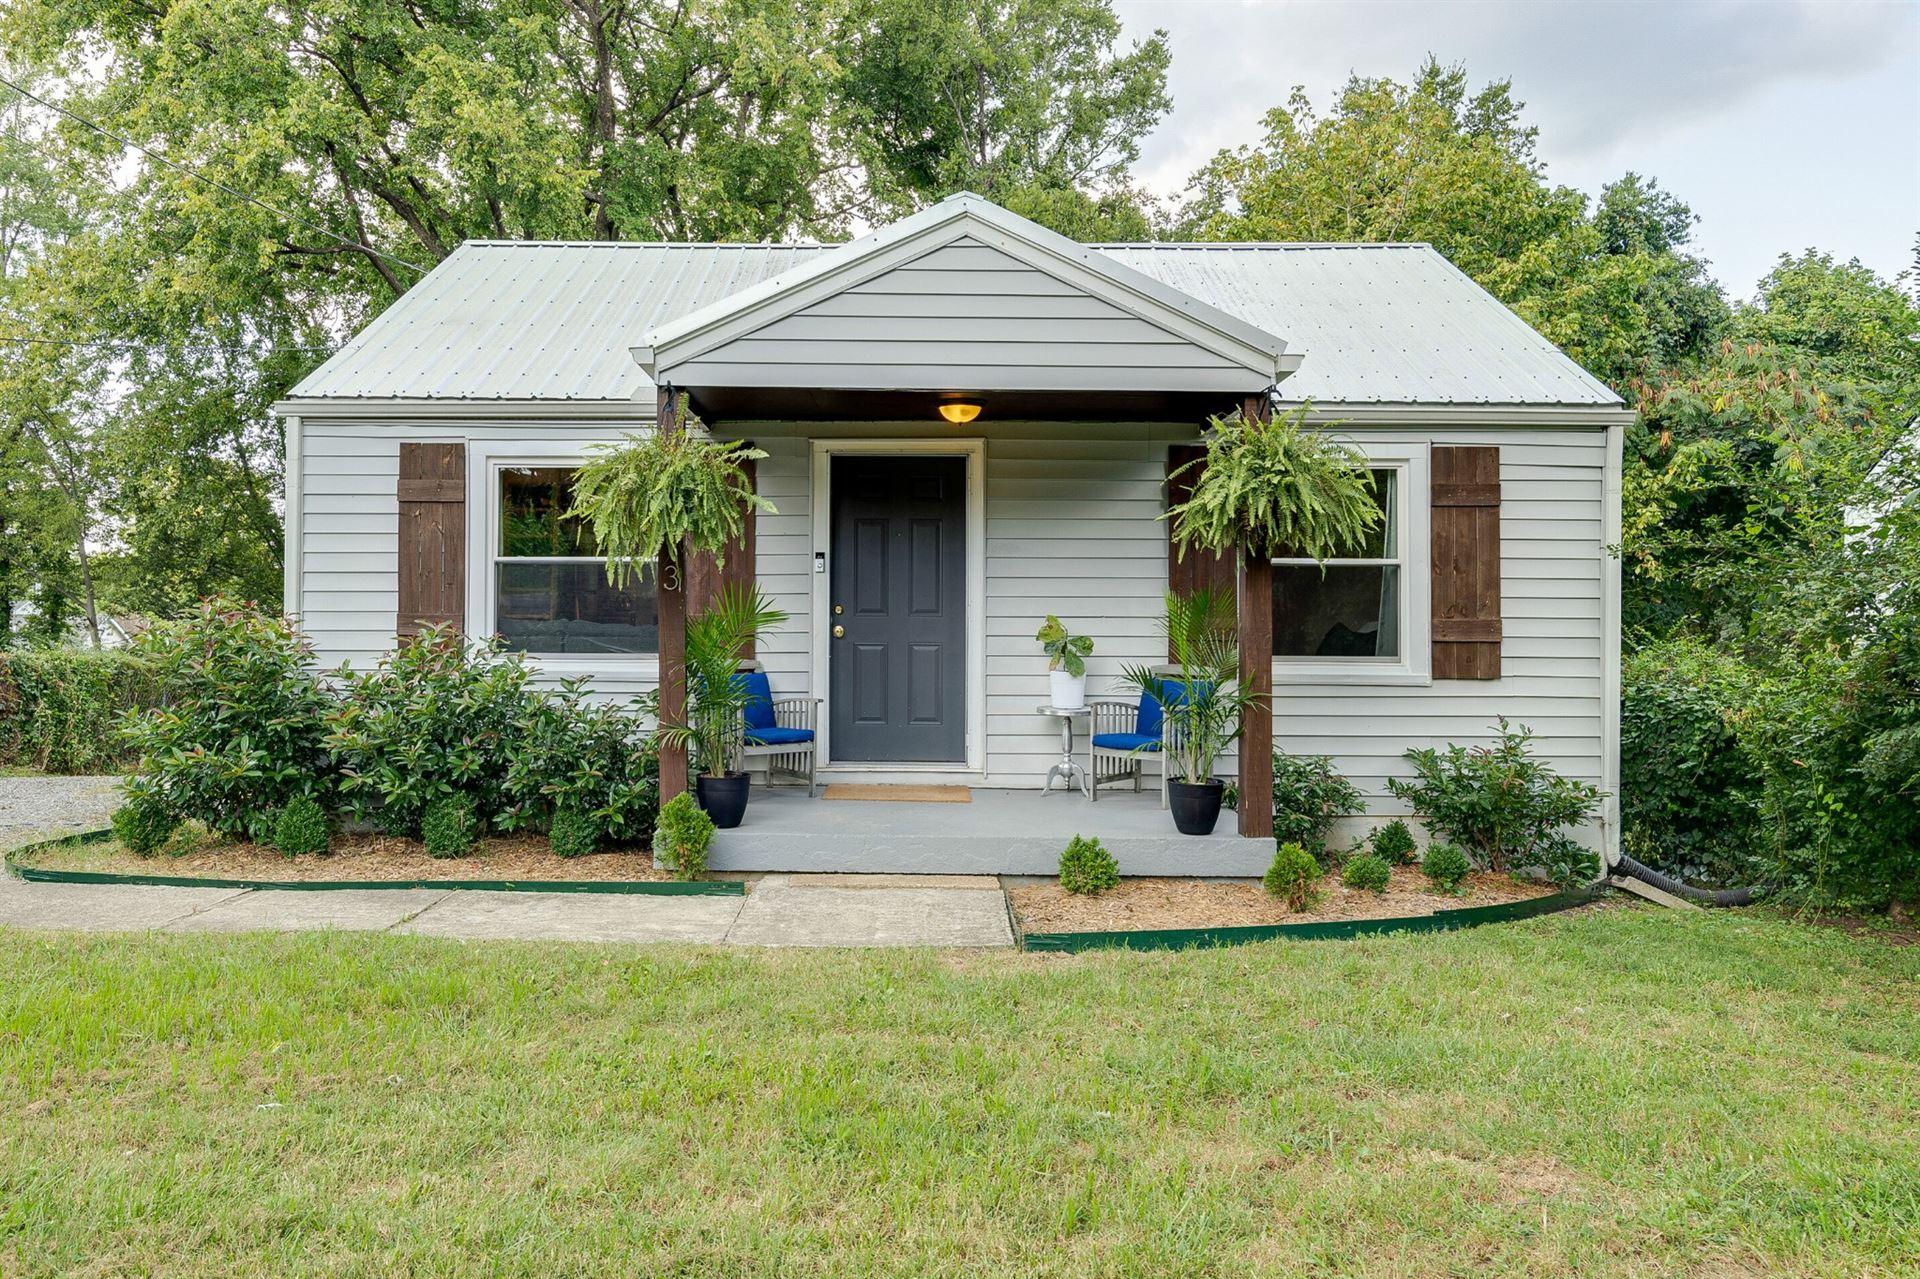 1613 Essex Ave, Nashville, TN 37216 - MLS#: 2291636